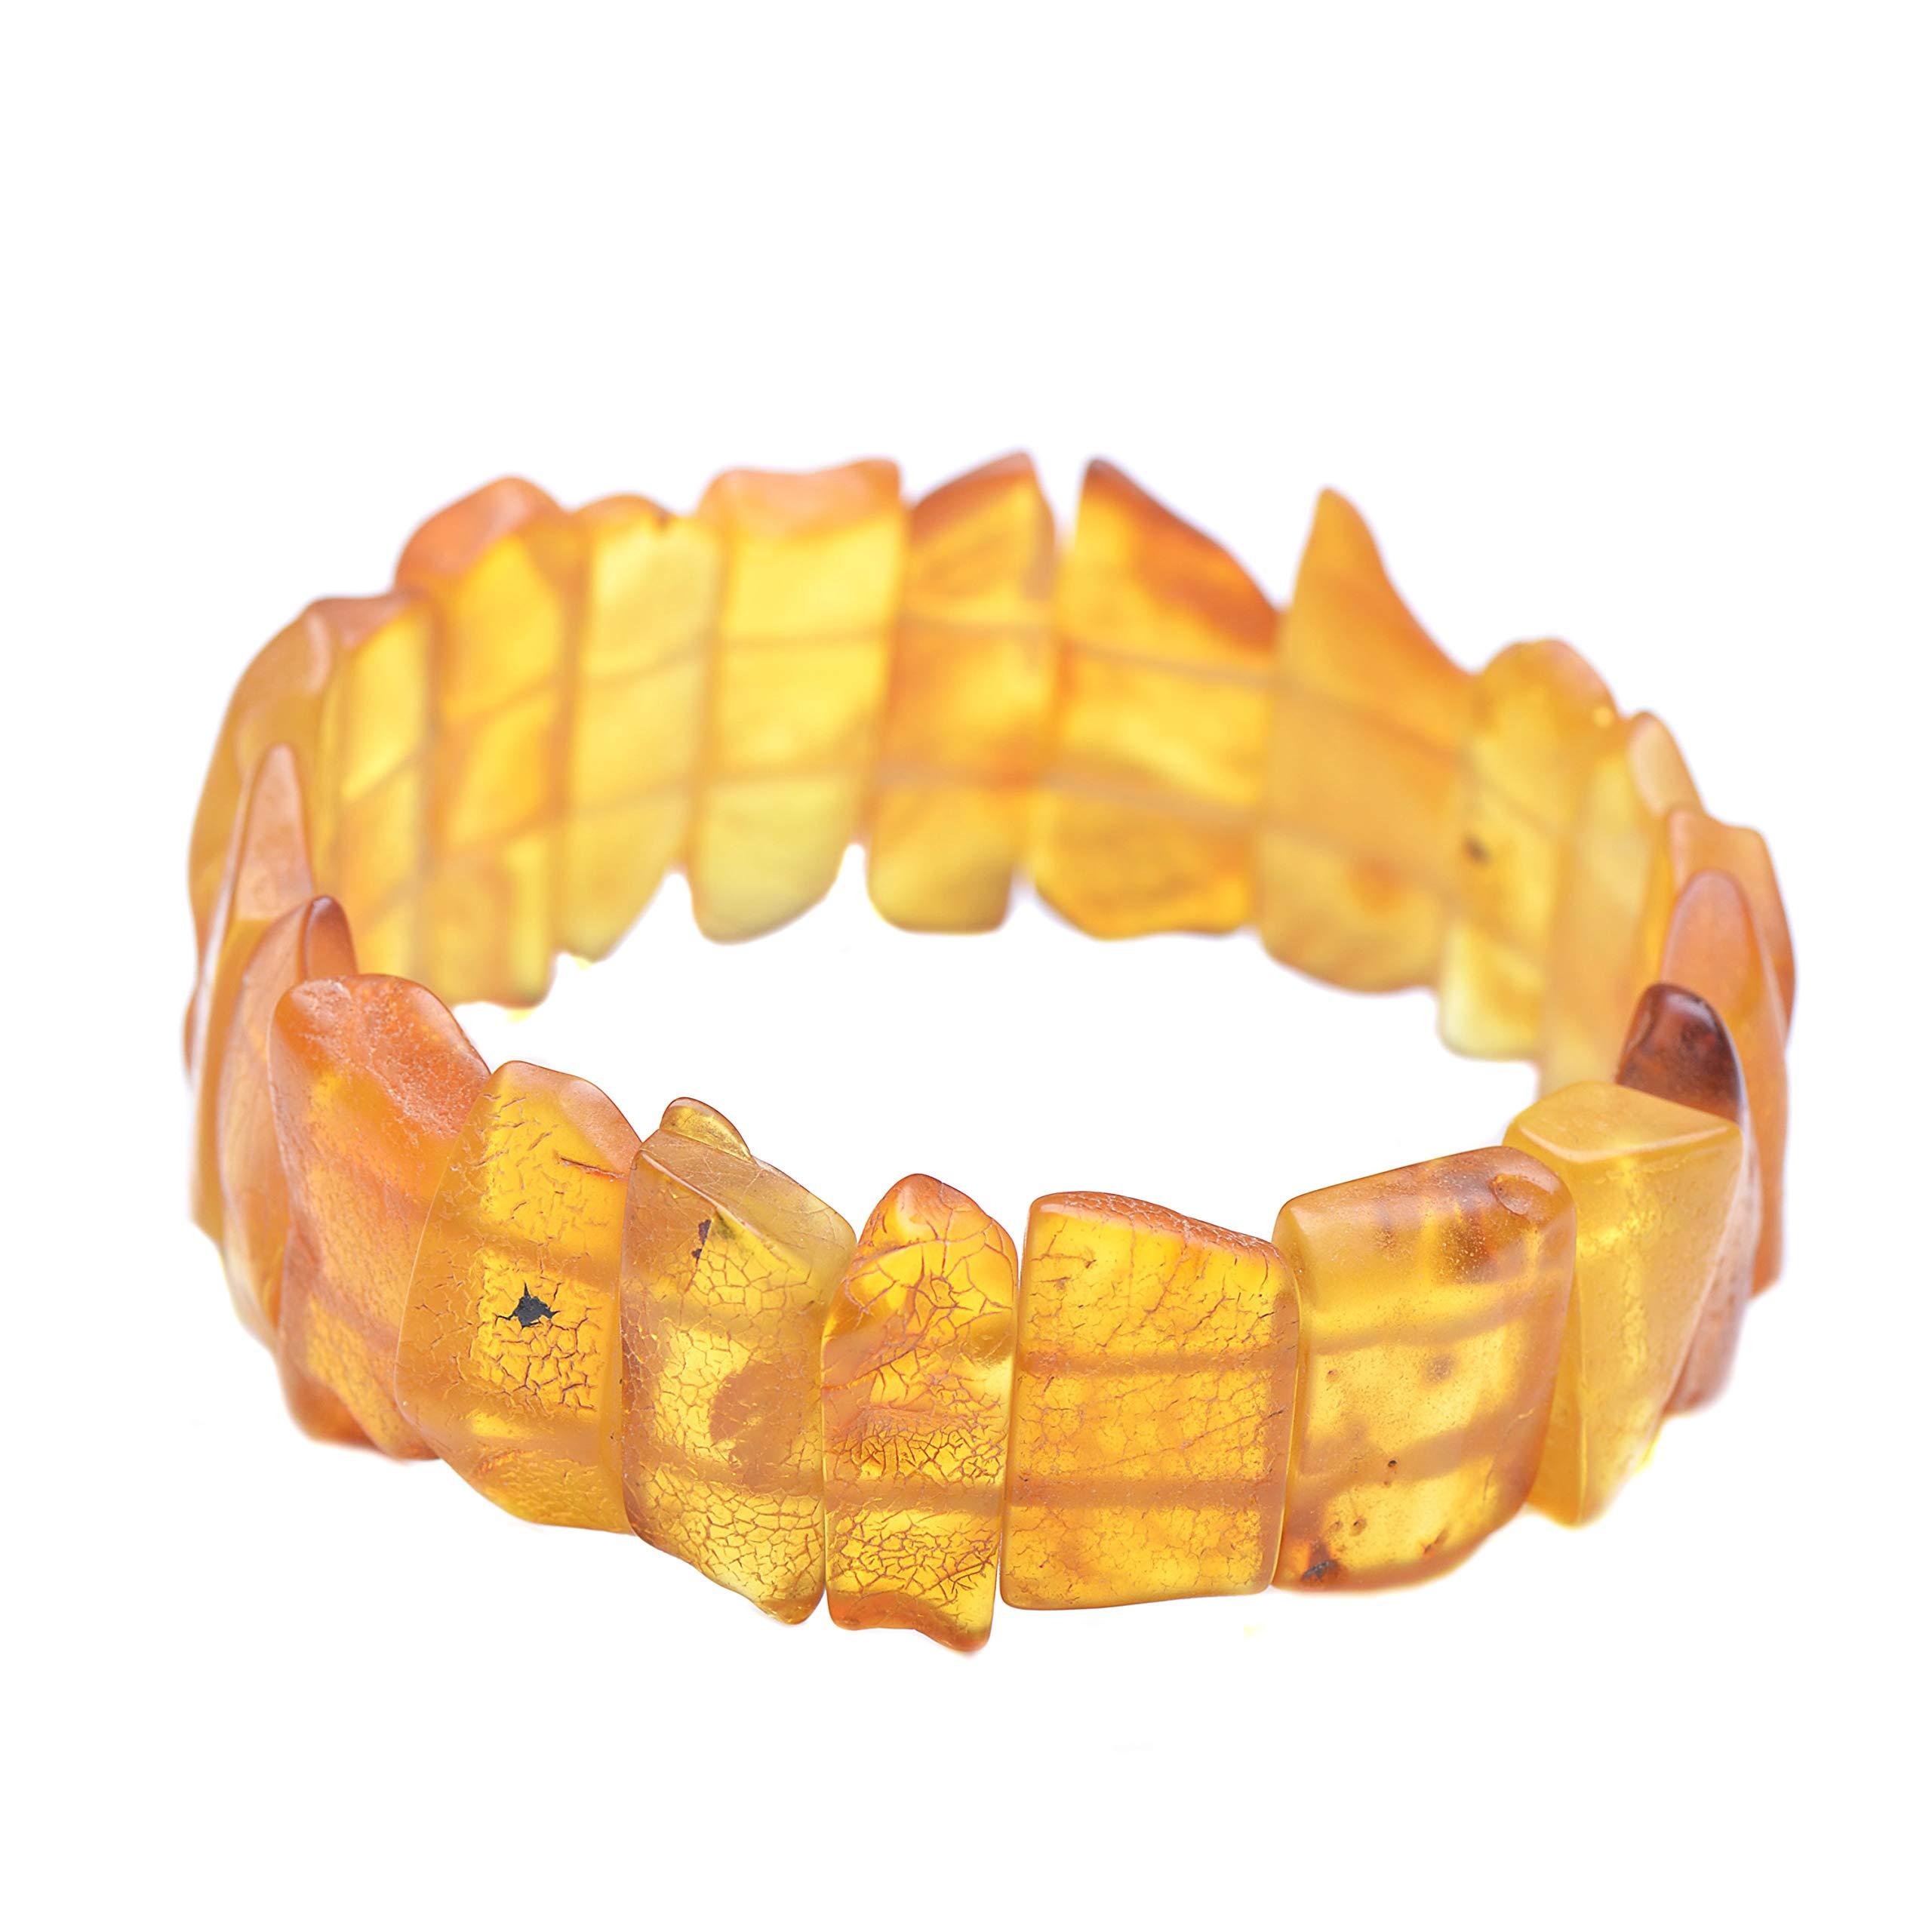 Amber Bracelet - Unique Amber Bracelet - Handmade Amber Jewelry - Baltic Amber Bracelet by Genuine Amber (Image #3)